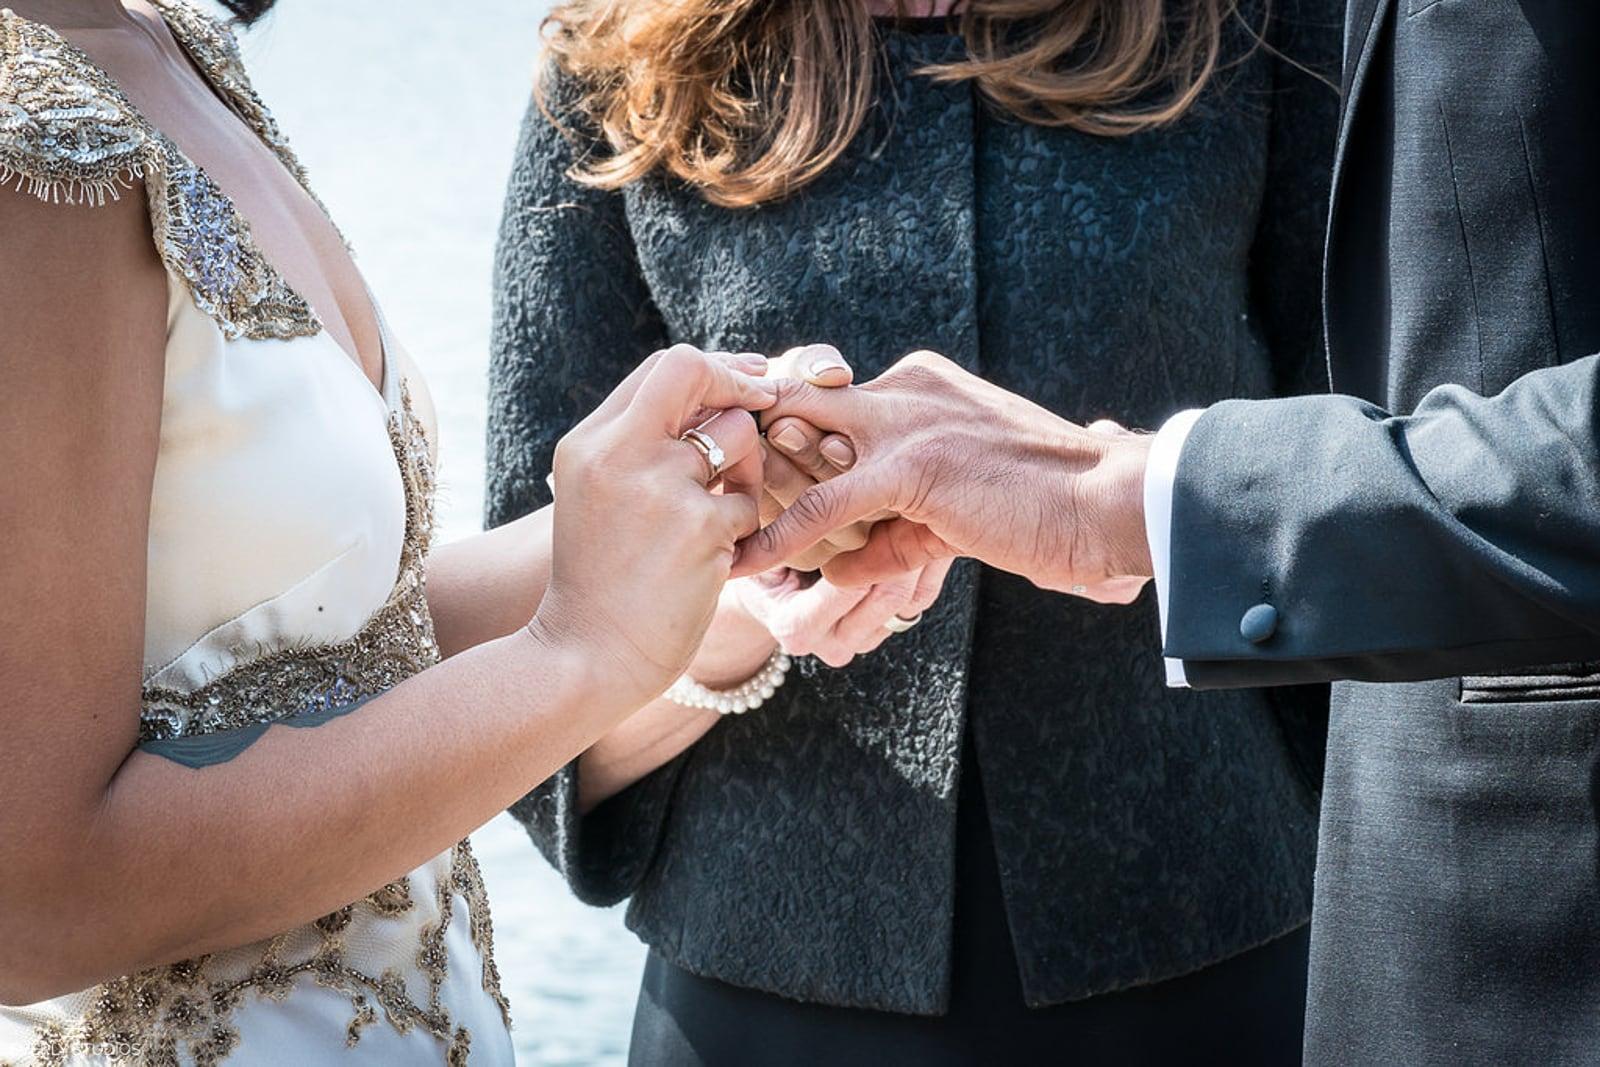 Brooklyn Bridge Park wedding. Photos by New York elopement photographer Everly Studios, www.everlystudios.com